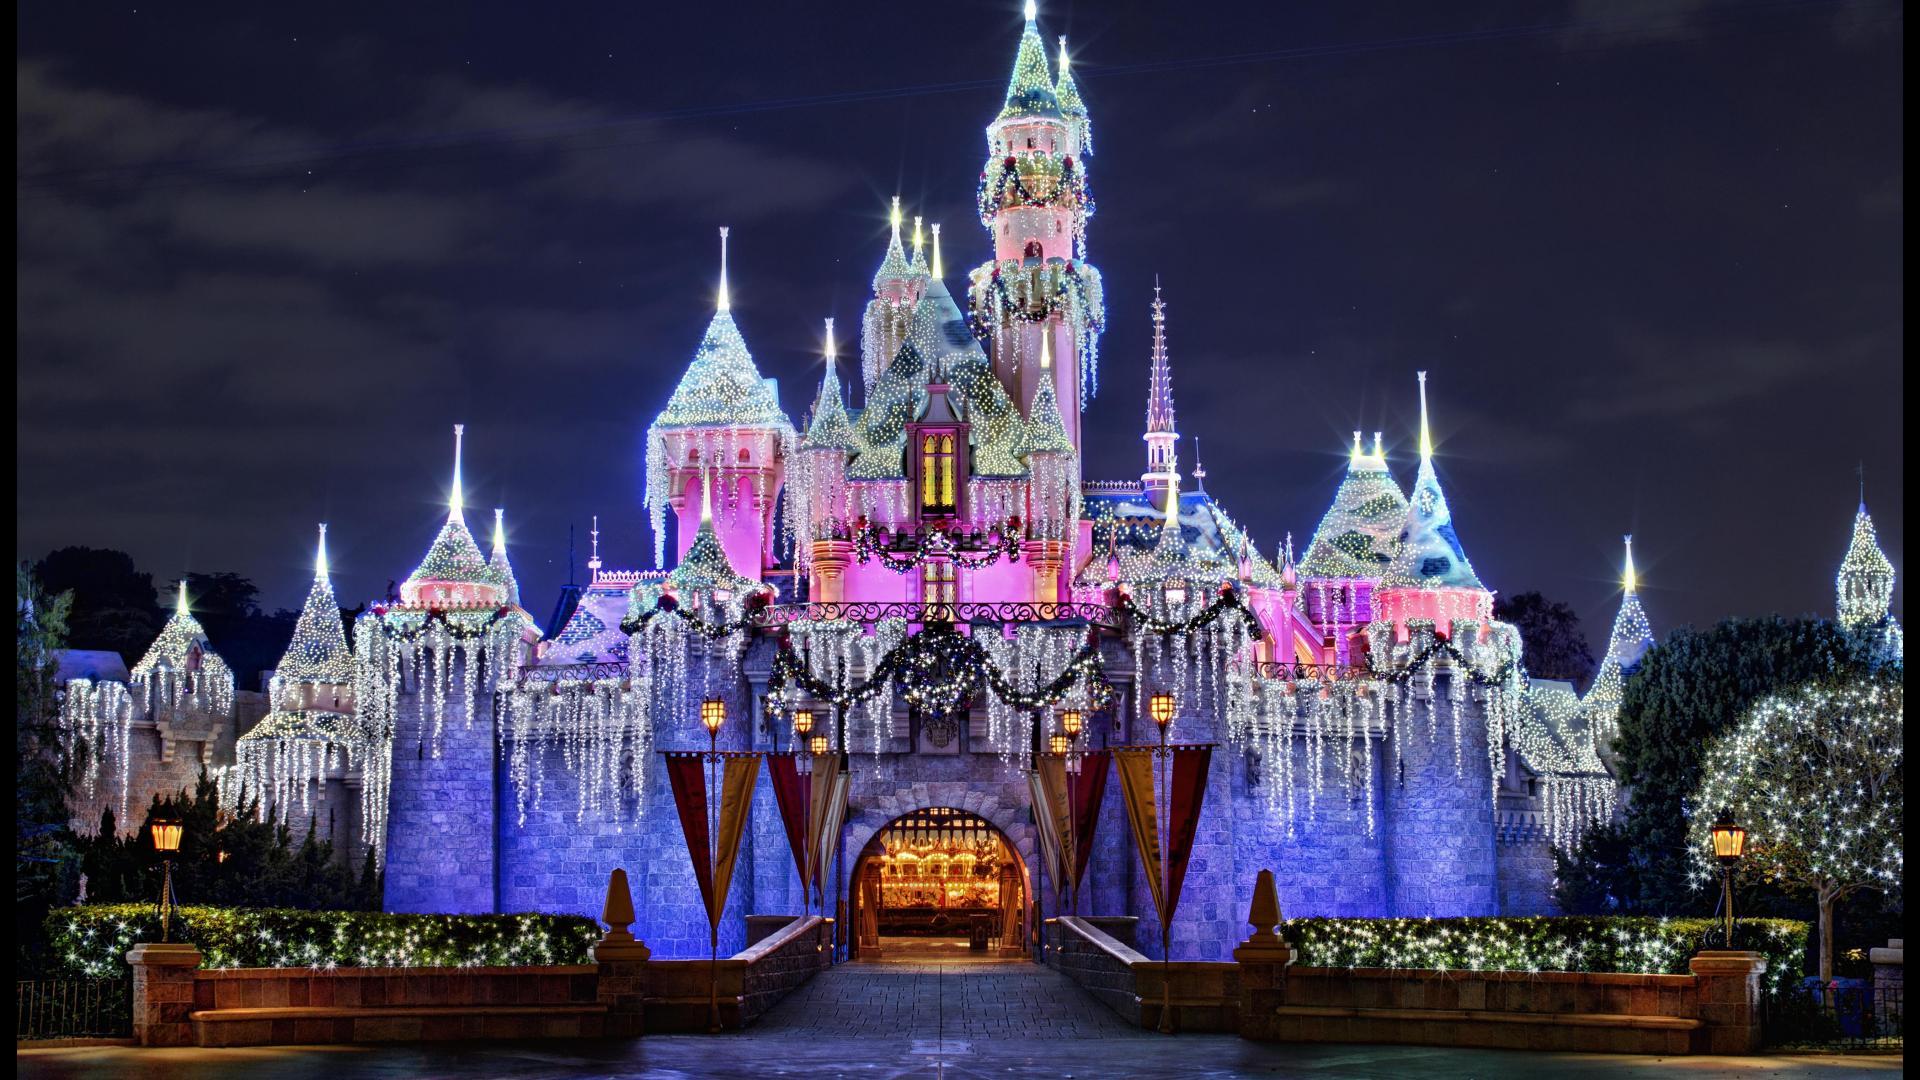 Disneyland HD Wallpapers